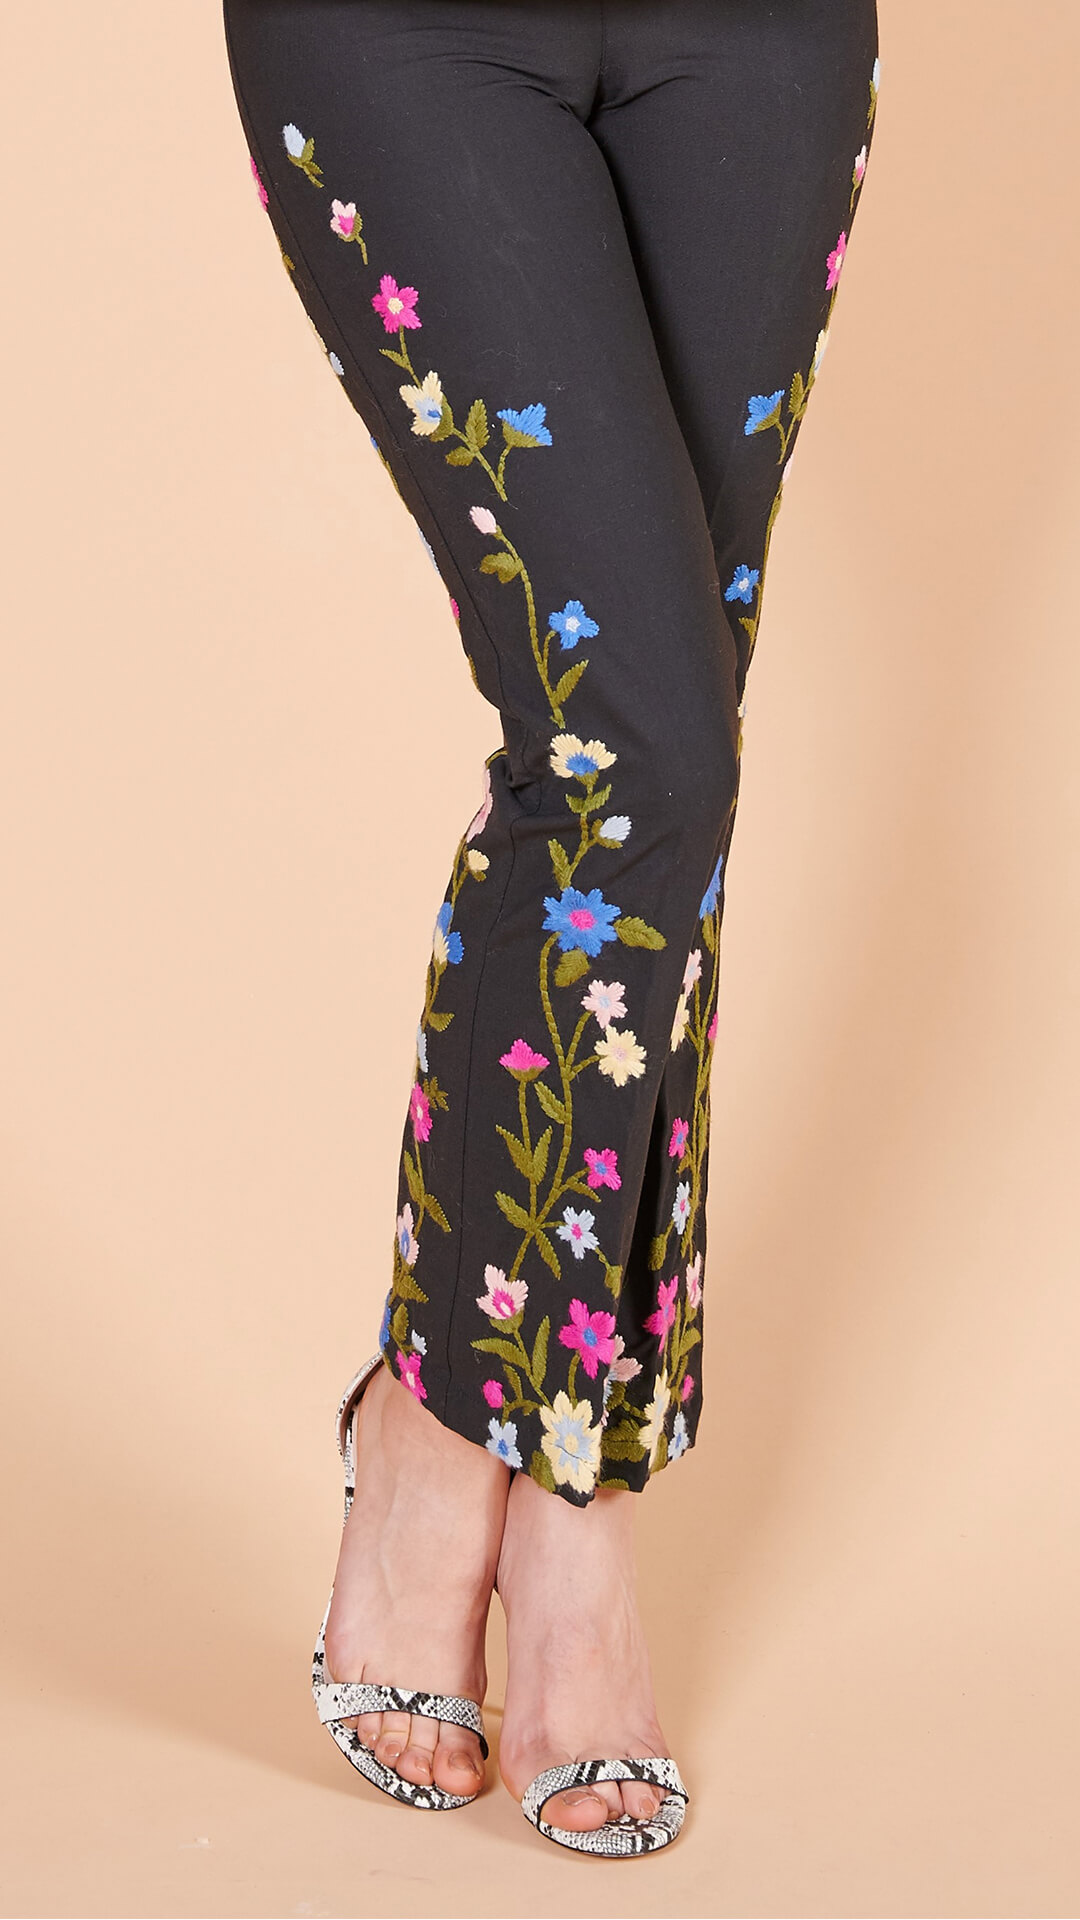 90lar Moschino streç çiçek işlemeli geniş paça pantolon